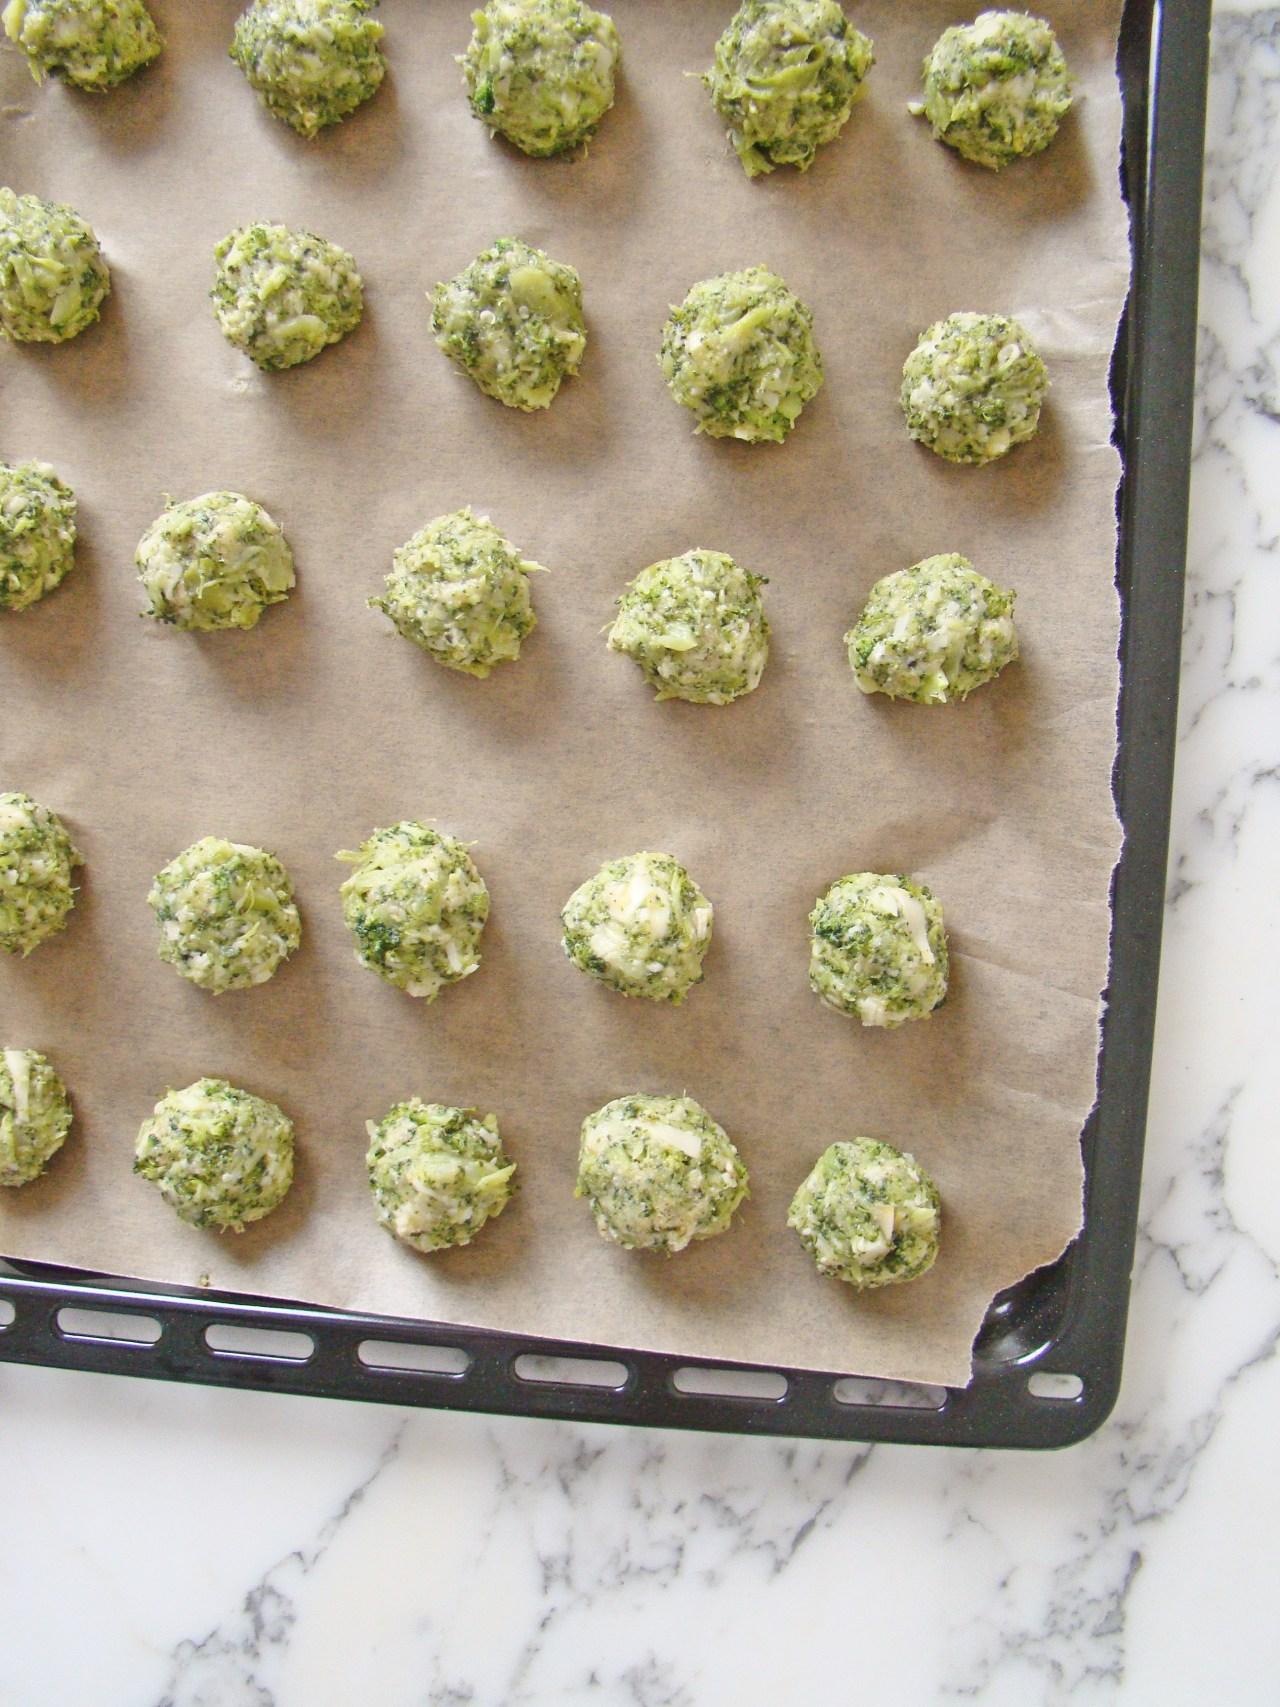 Healthy Baked Broccoli Bites